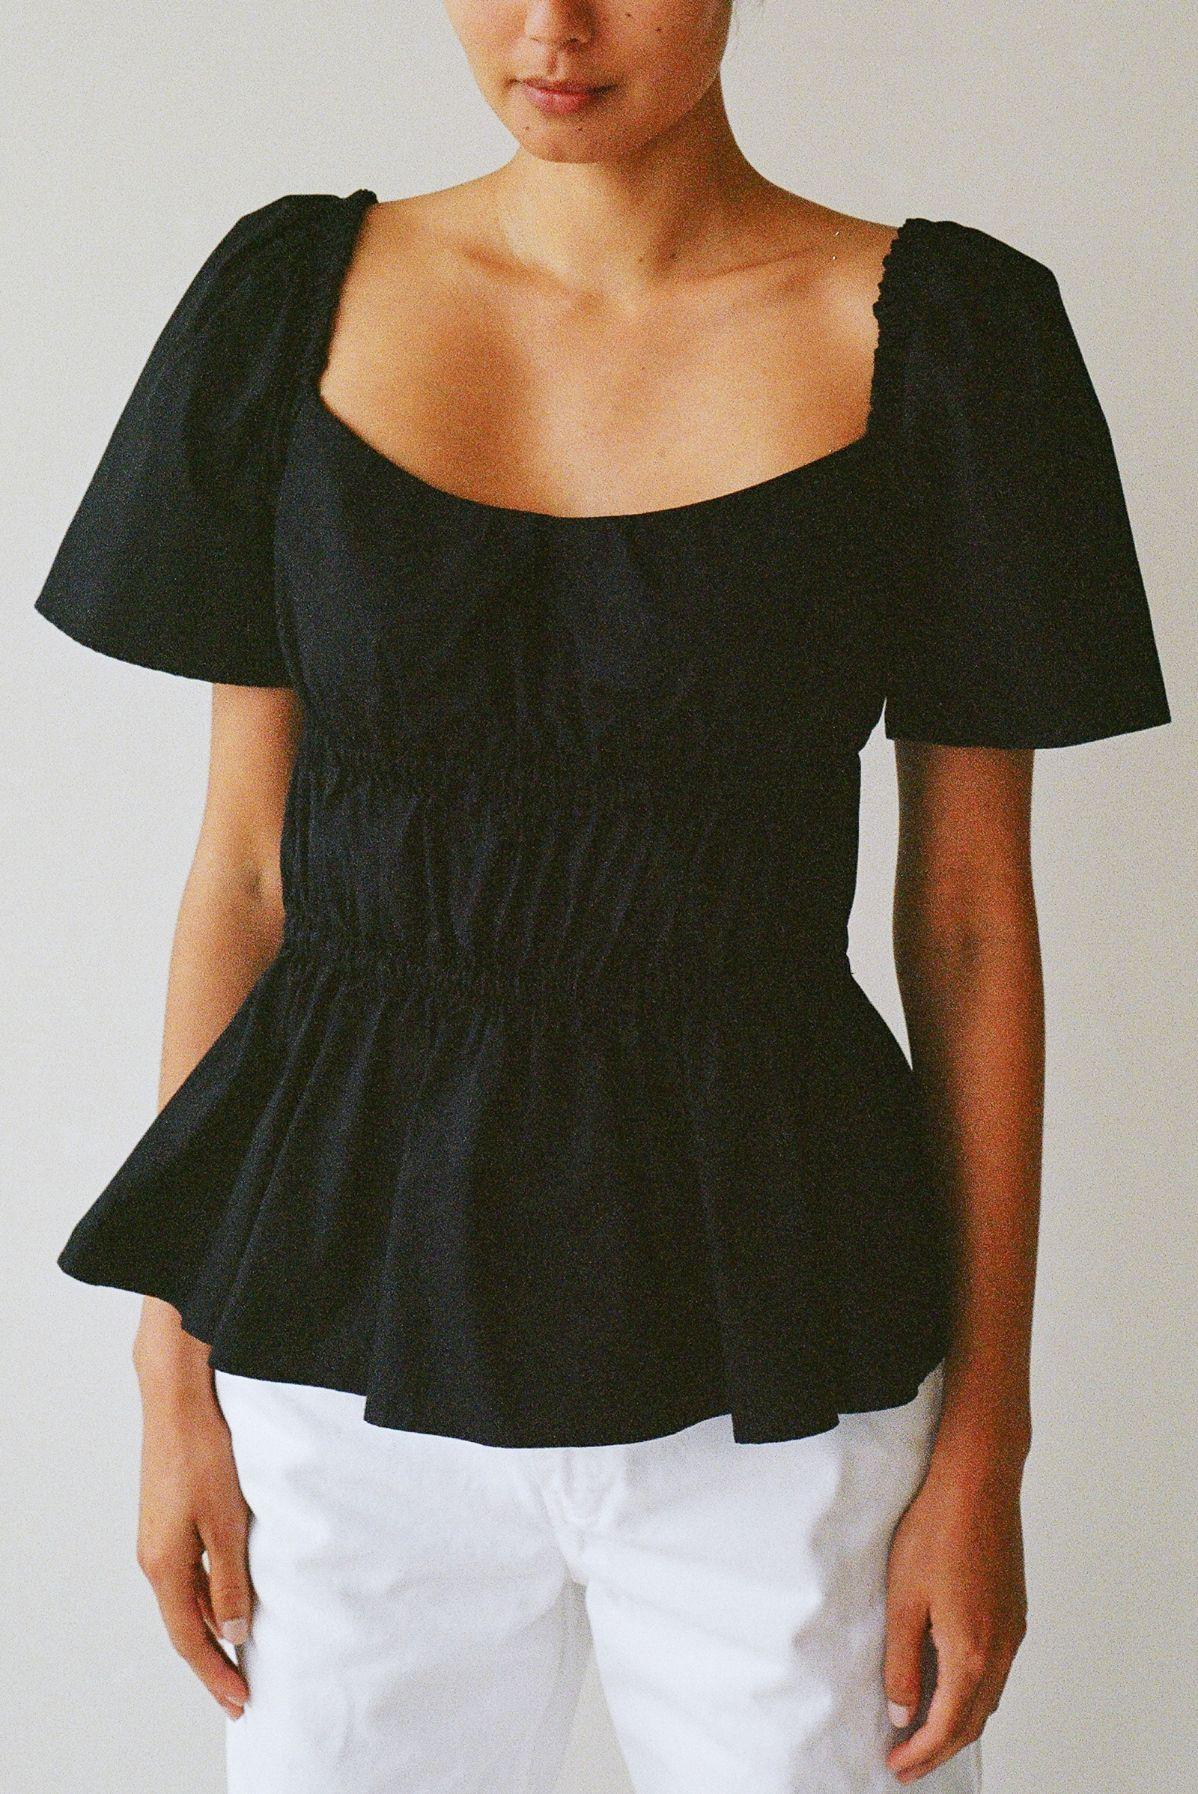 Bodice top black - Ellis Label - Womens designer clothing New Zealand_0027_82980003